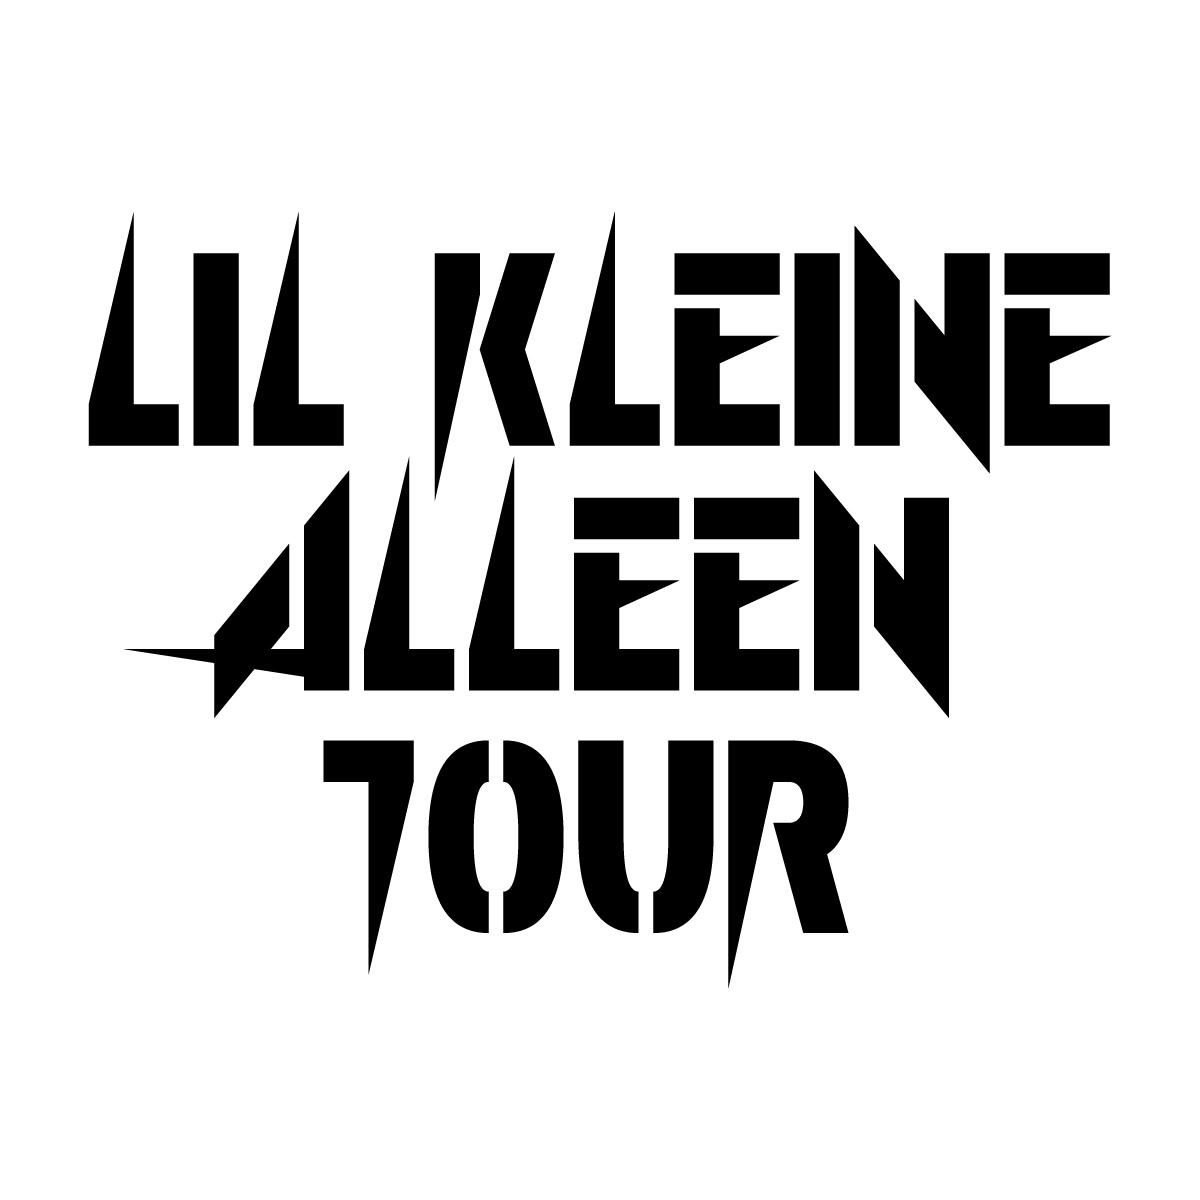 Alleen Tour logo - zwart